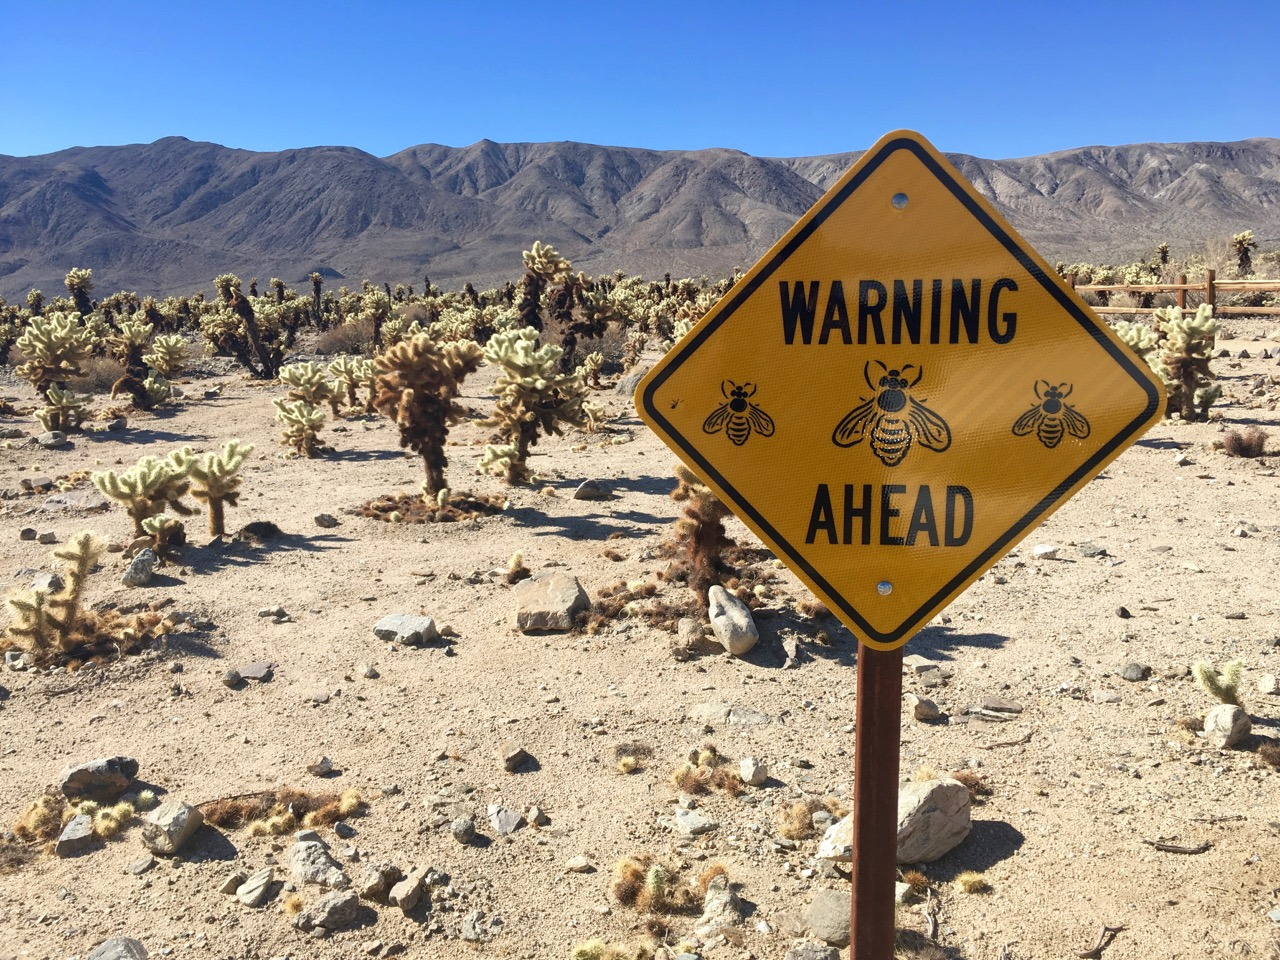 Sign warning of bees ahead